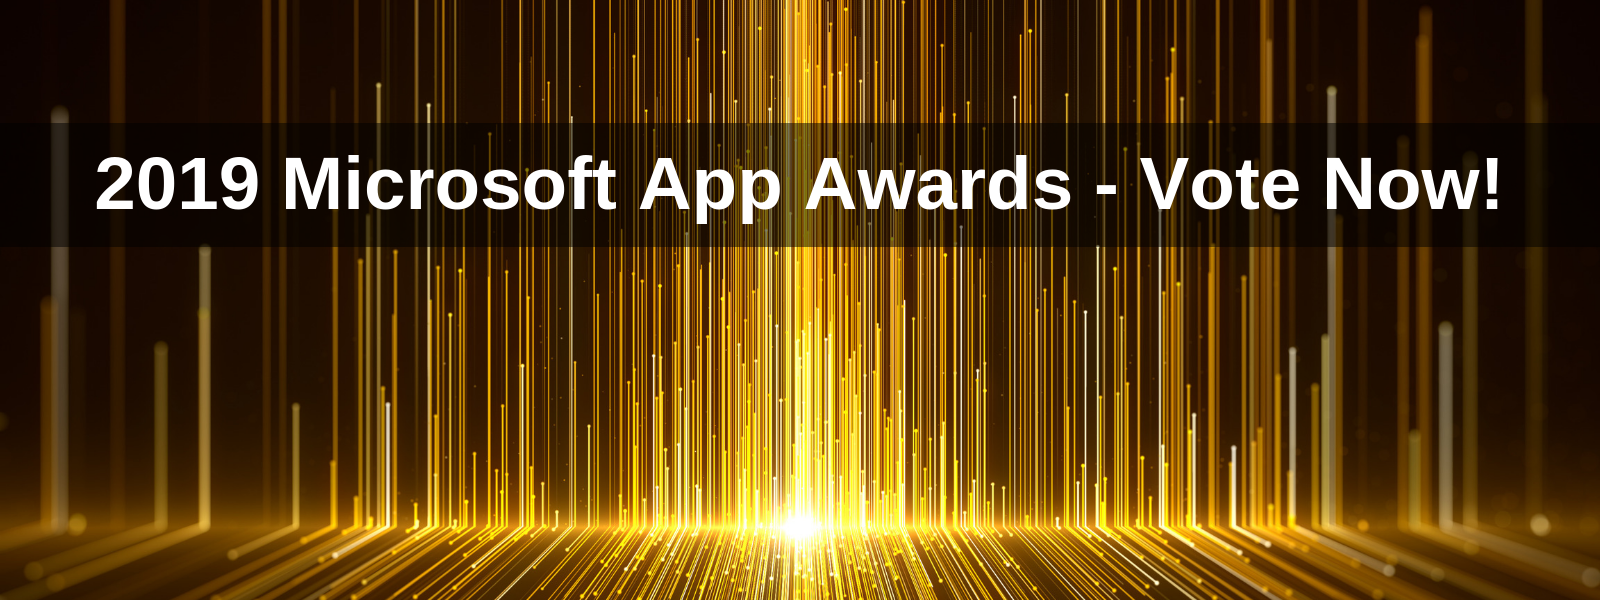 2019 Microsoft App Awards - Vote Now!